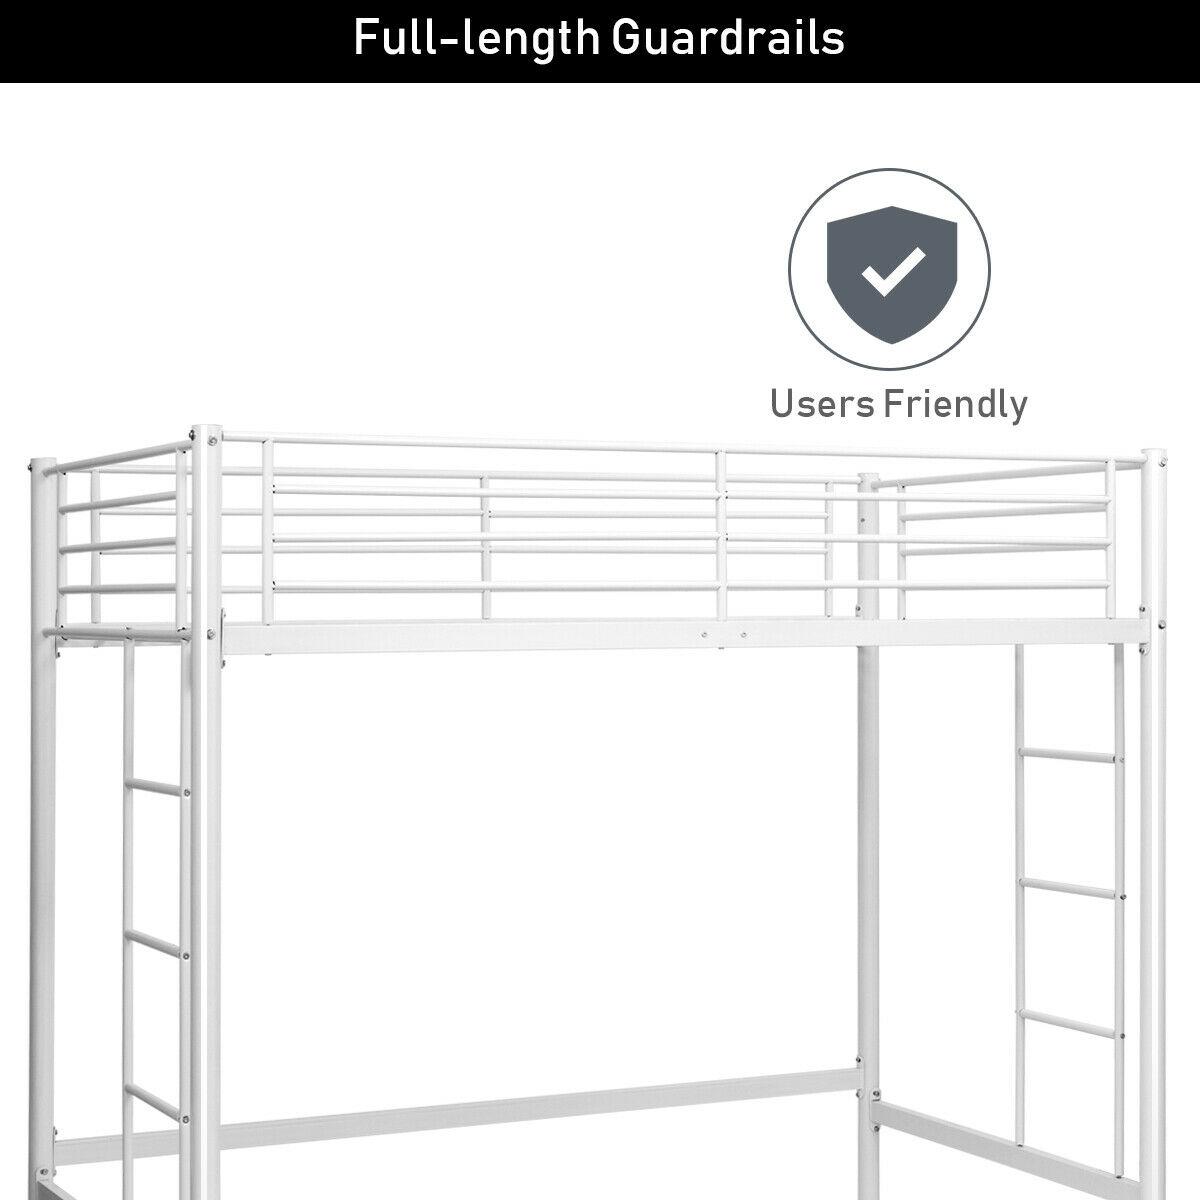 Twin Loft Bed Metal Bunk Ladder Beds for Bedroom Dorm